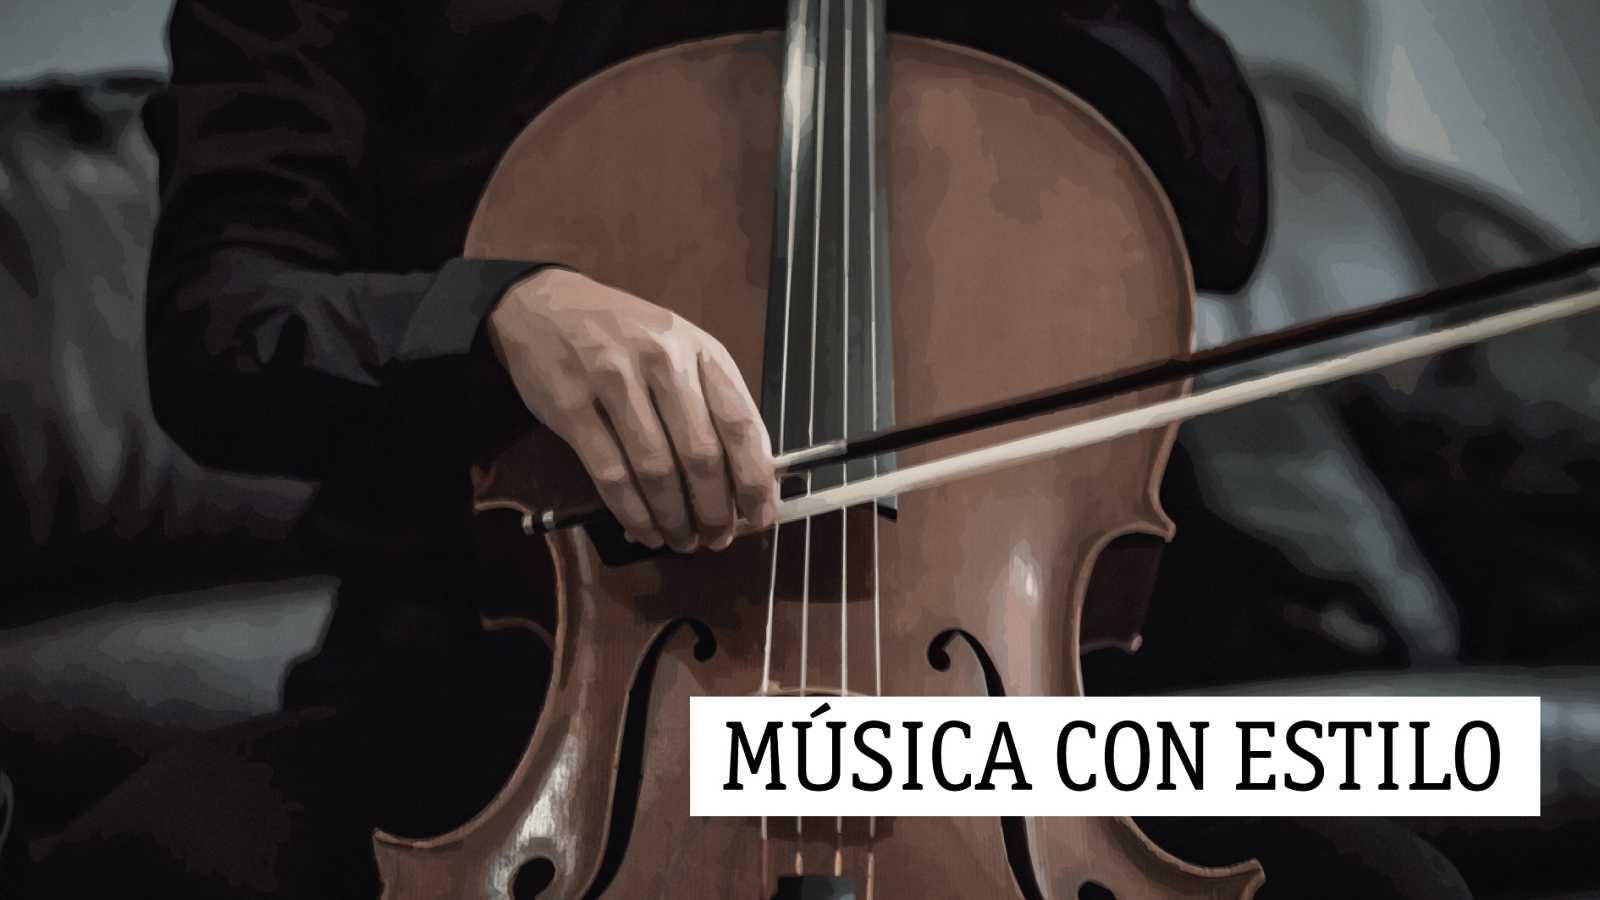 Música con estilo - Domenico Scarlatti, maestro de la reina - 11/08/19 - escuchar ahora